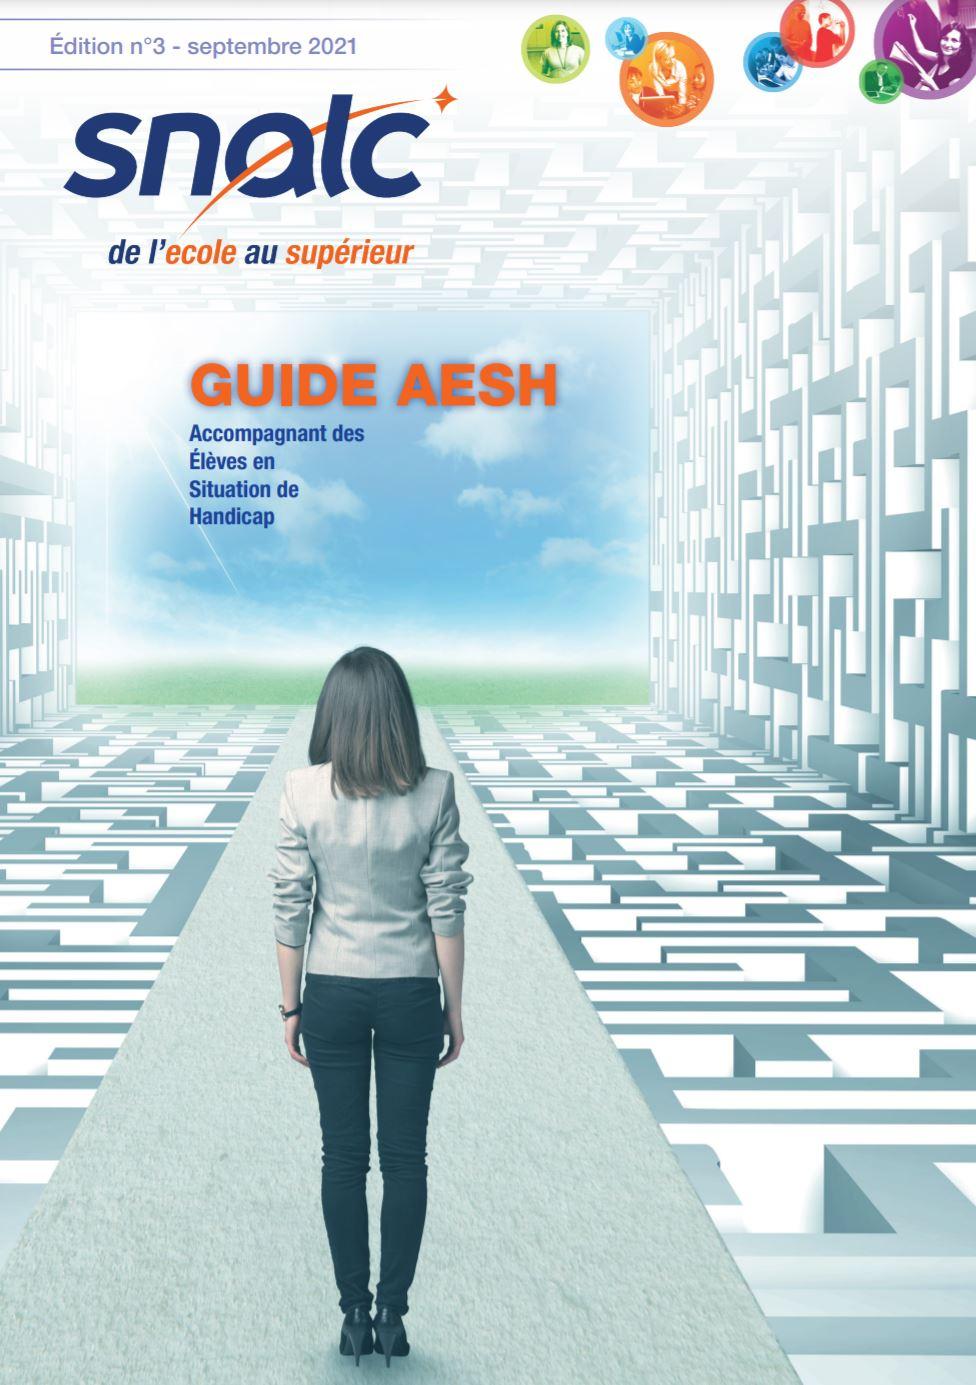 Guide AESH 2021